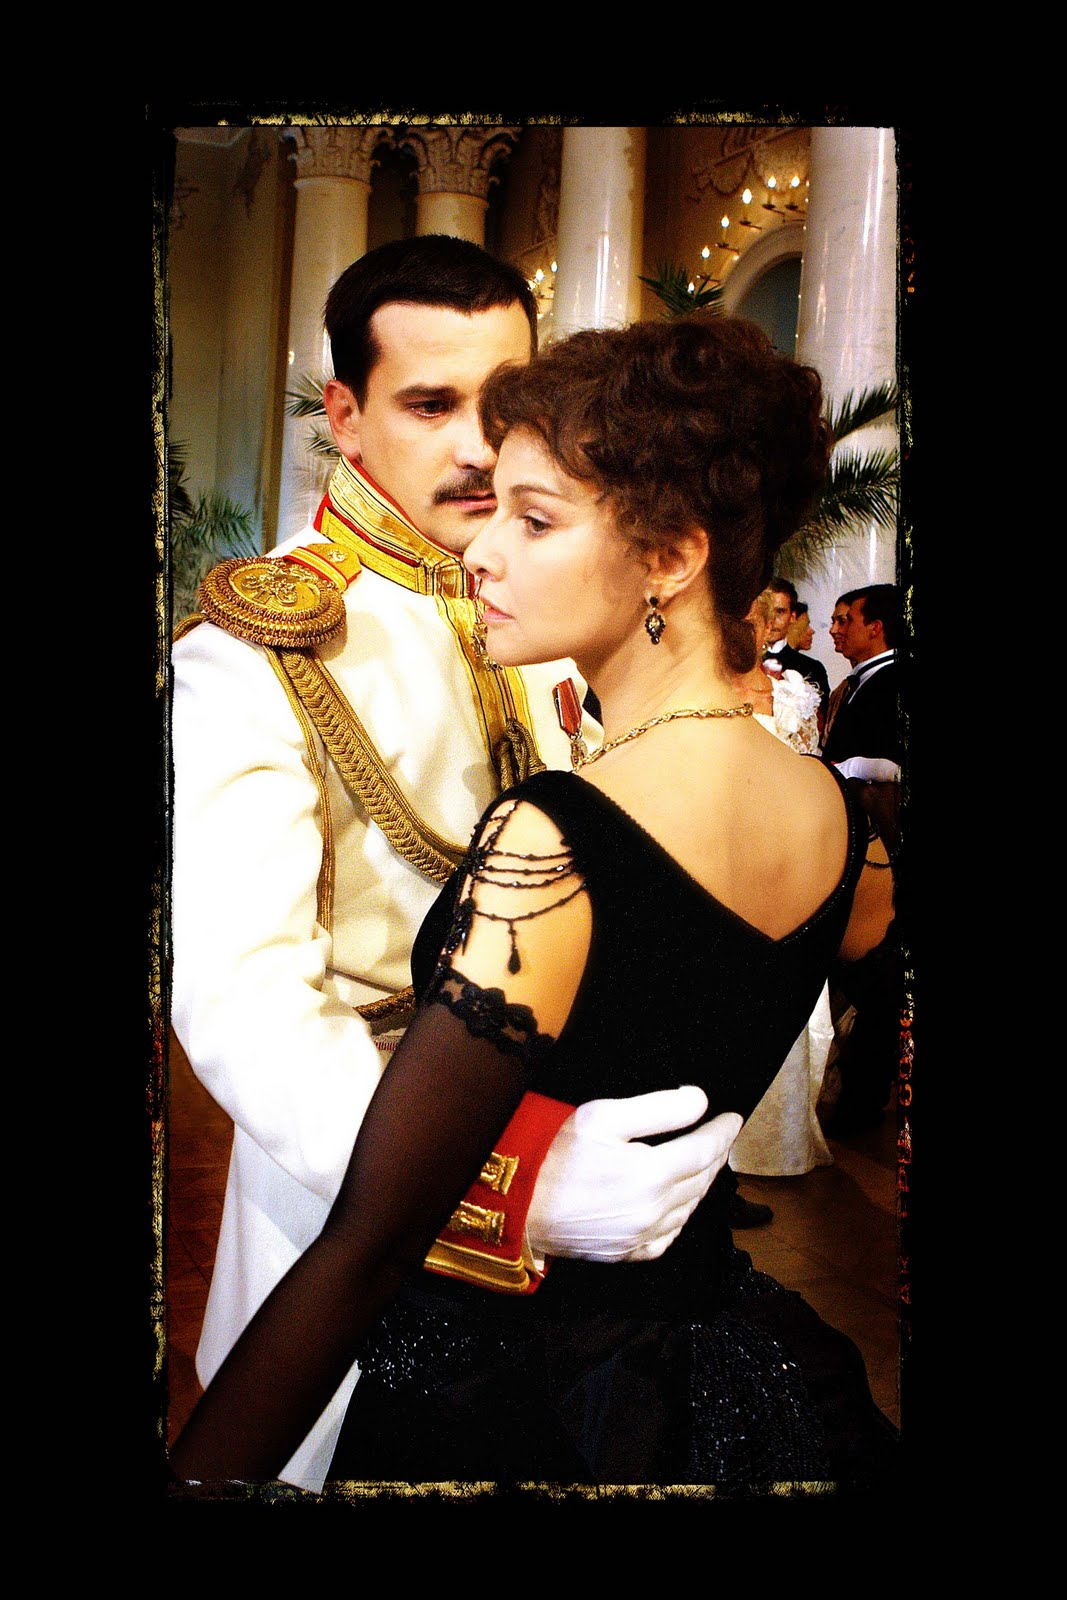 Anna Karenina 1985 Premiere - Anna Karenina